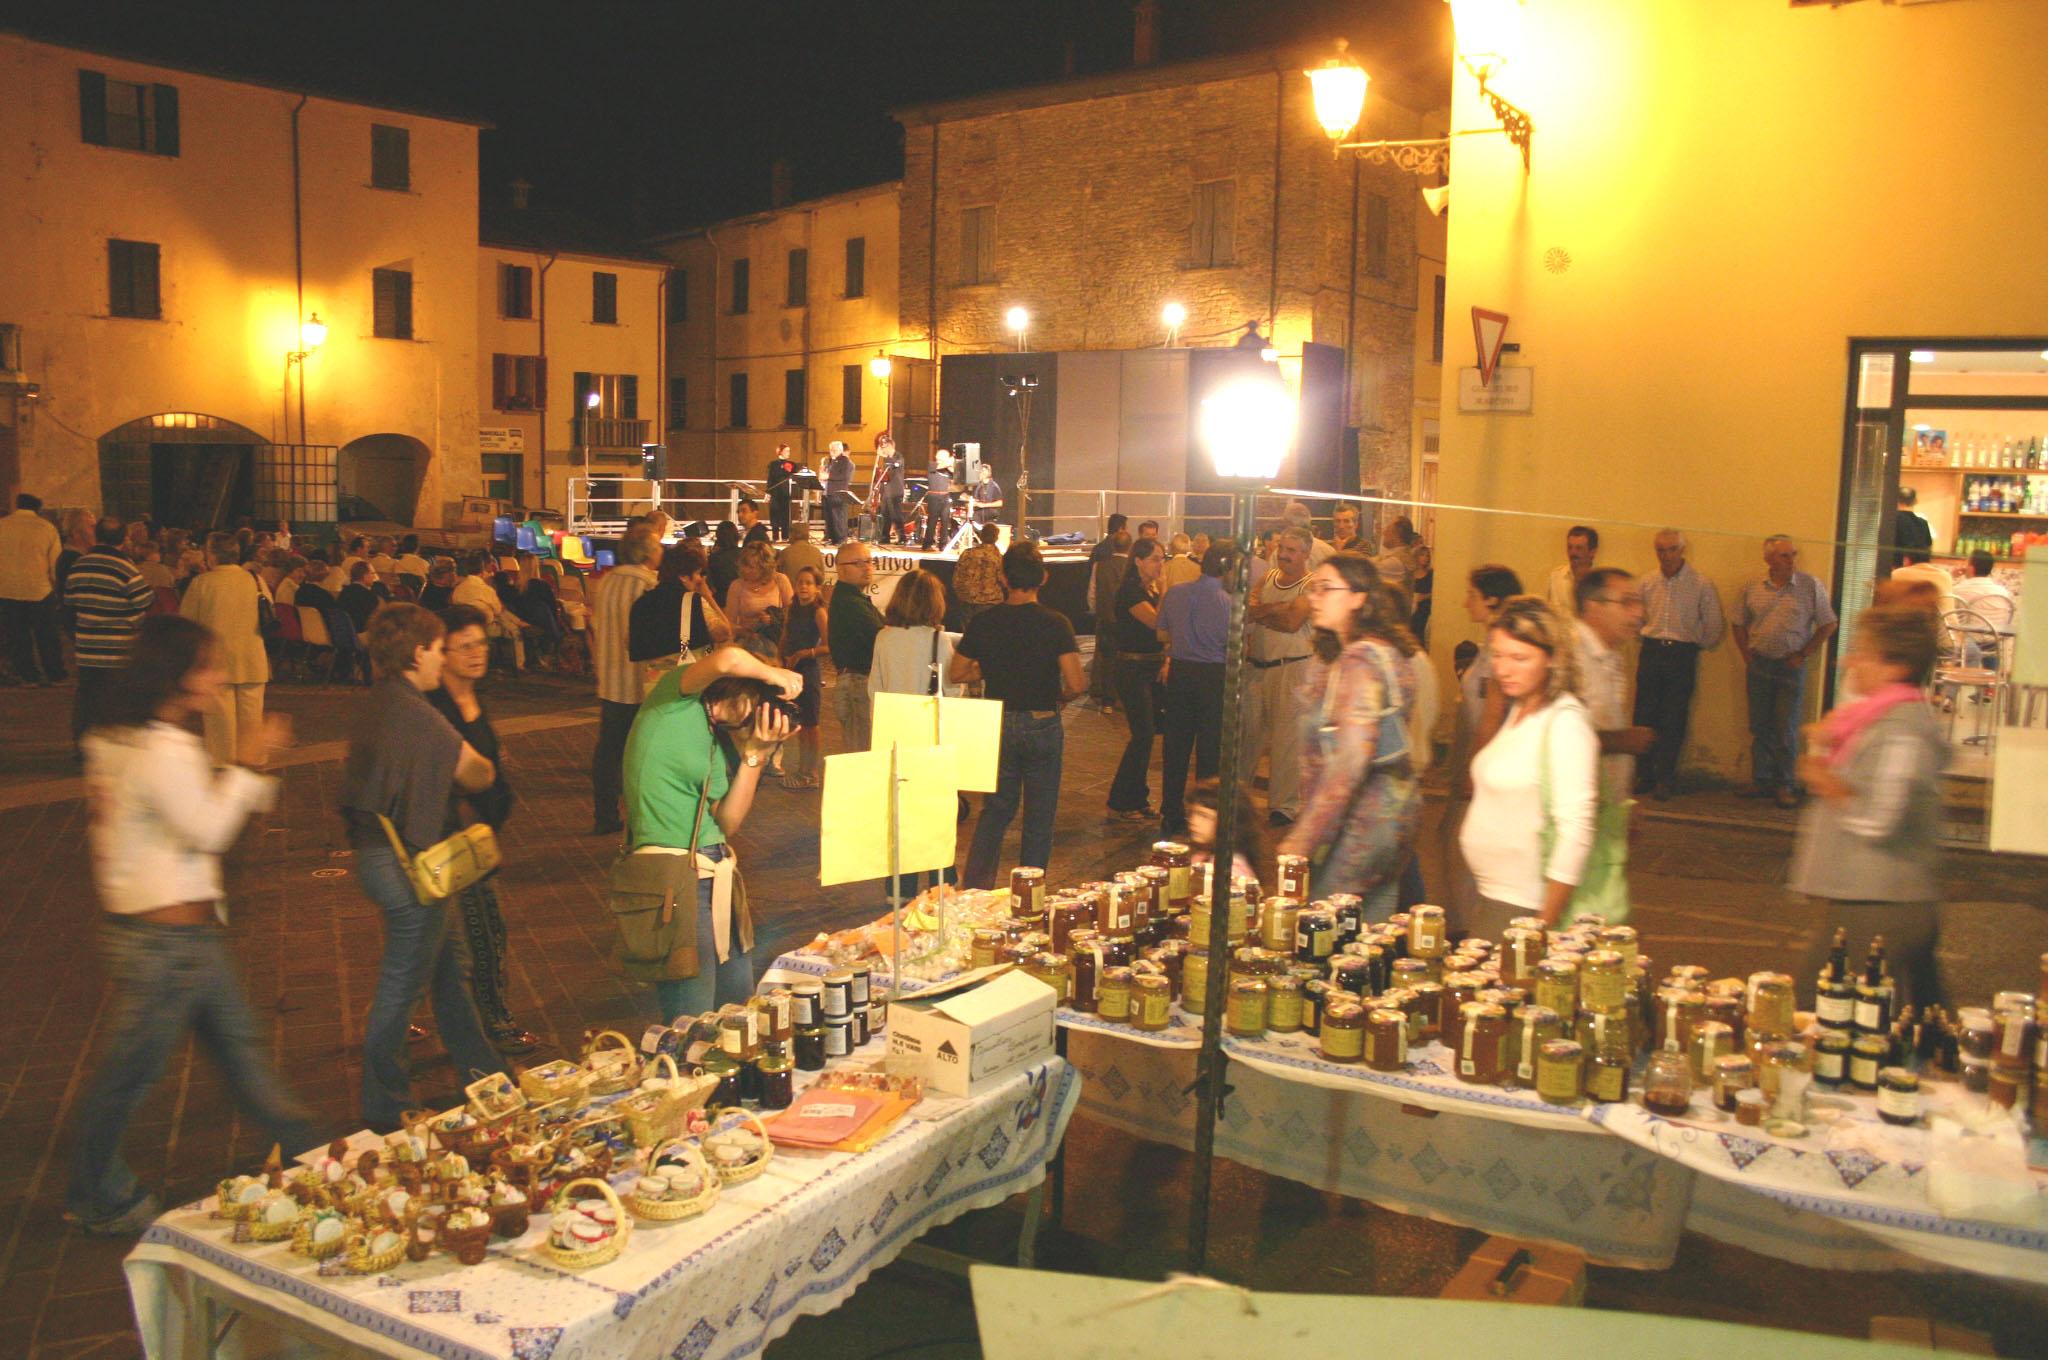 Tornano i mercatini serale a riolo terme brisighella - Mercatino ravenna ...